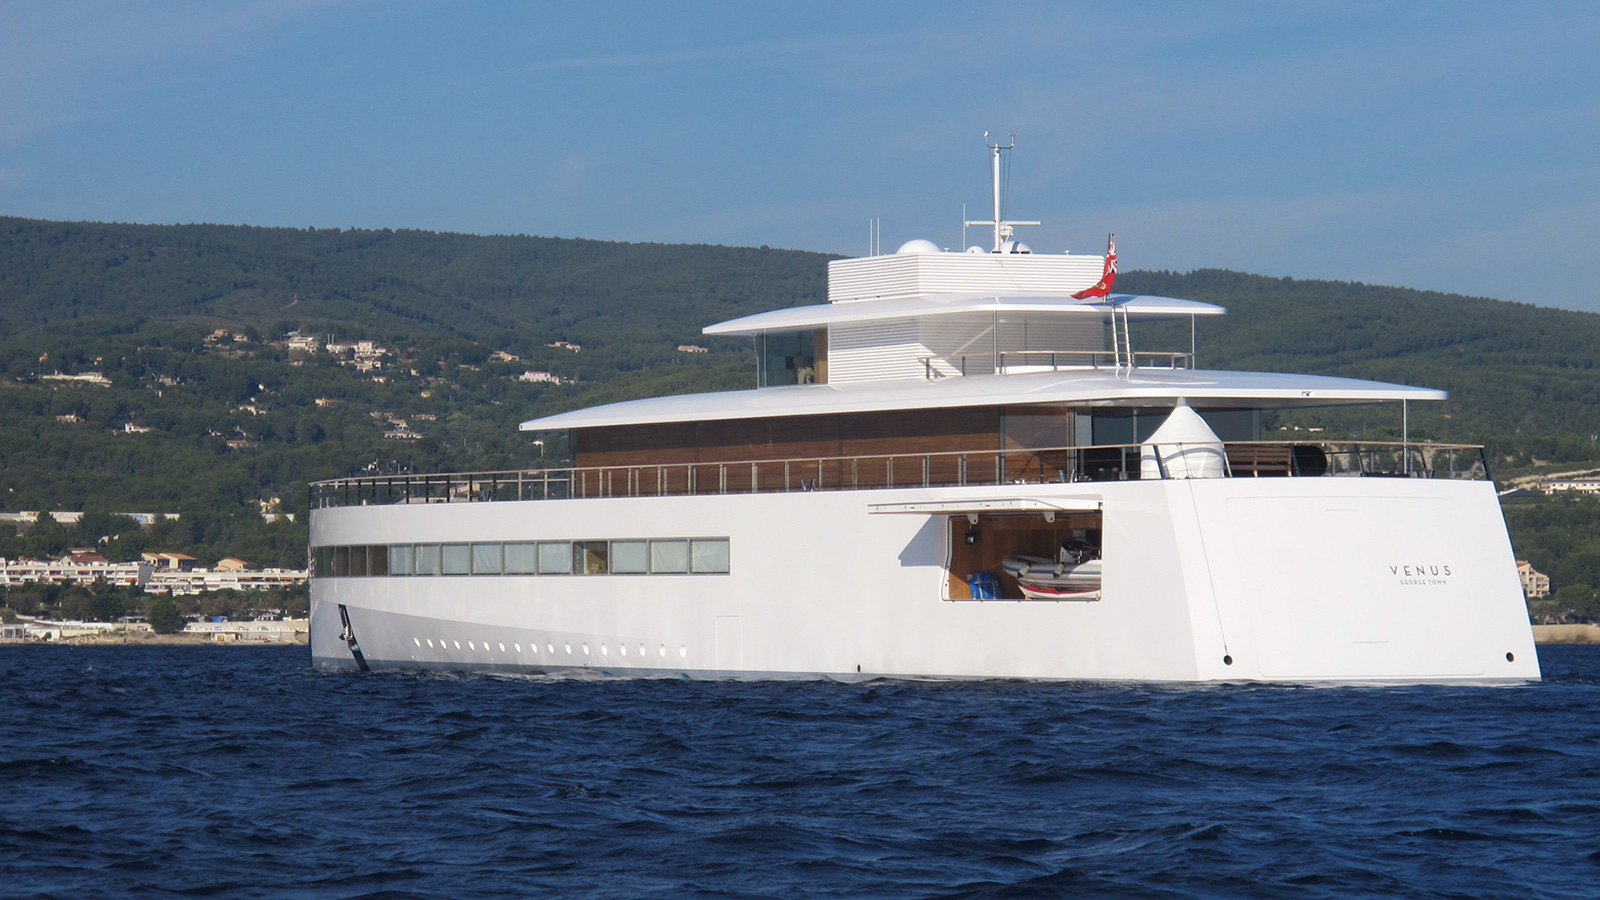 Venus Yacht Tender Garage